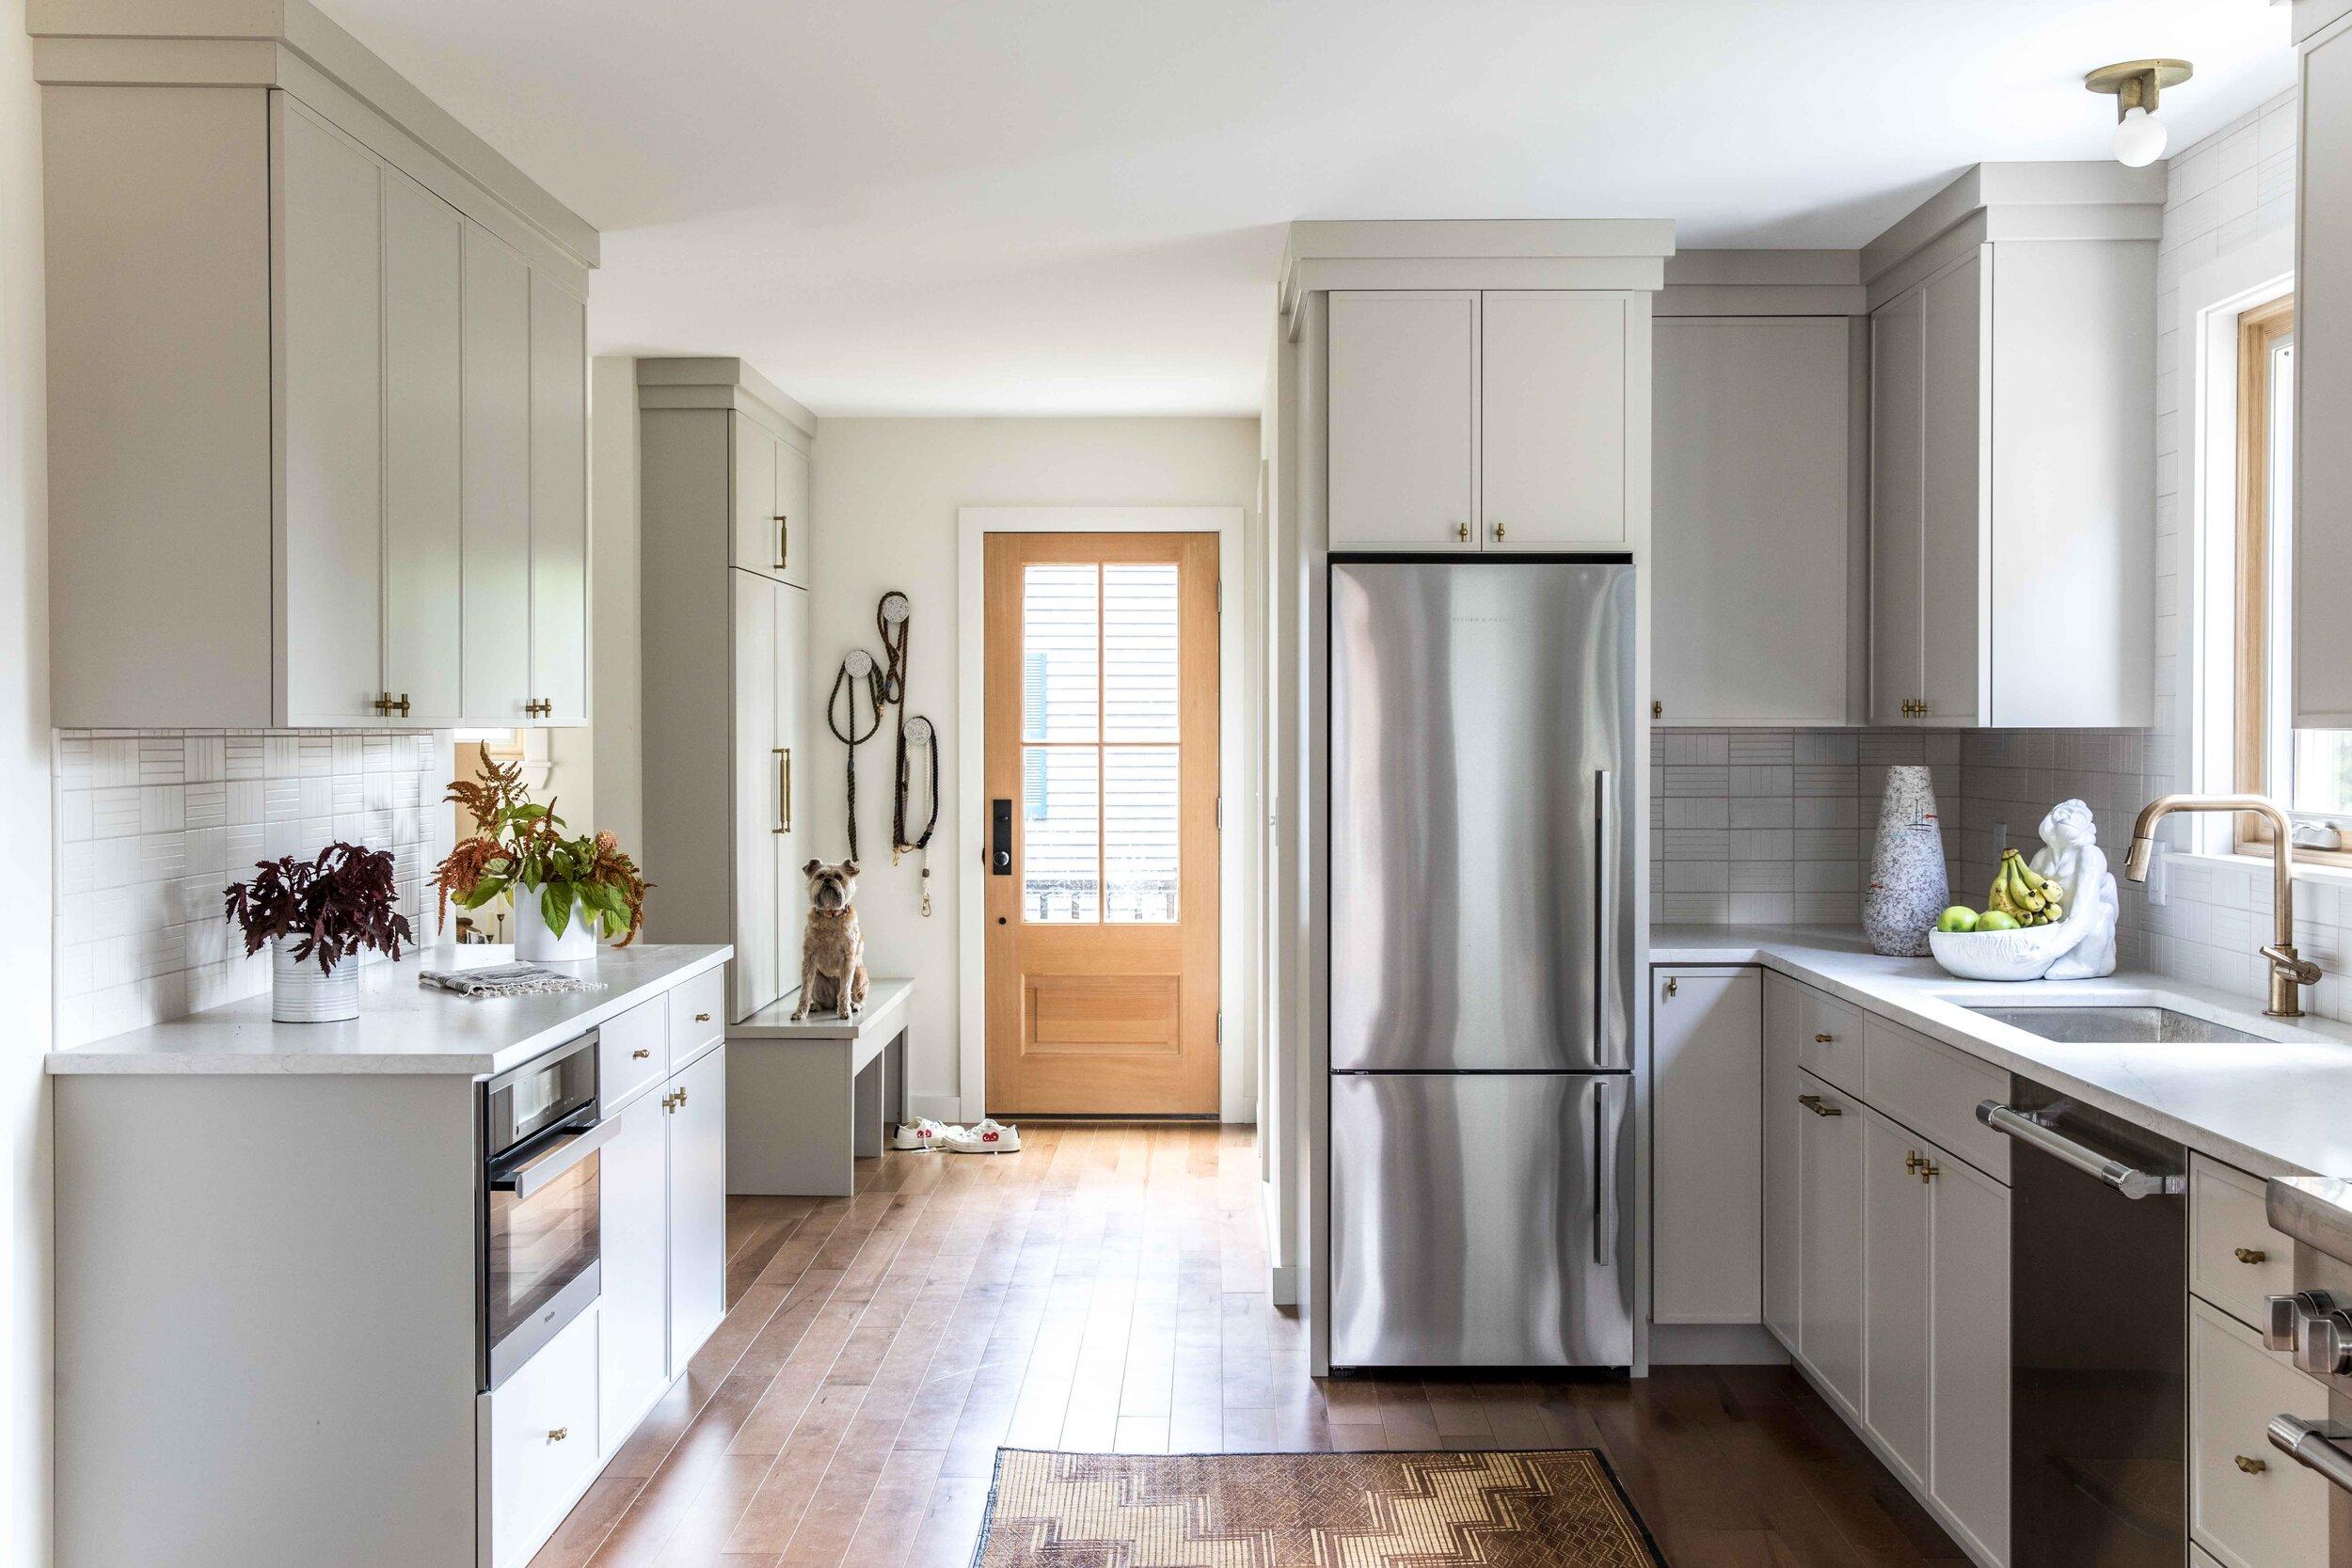 Mackworth Home Remodel